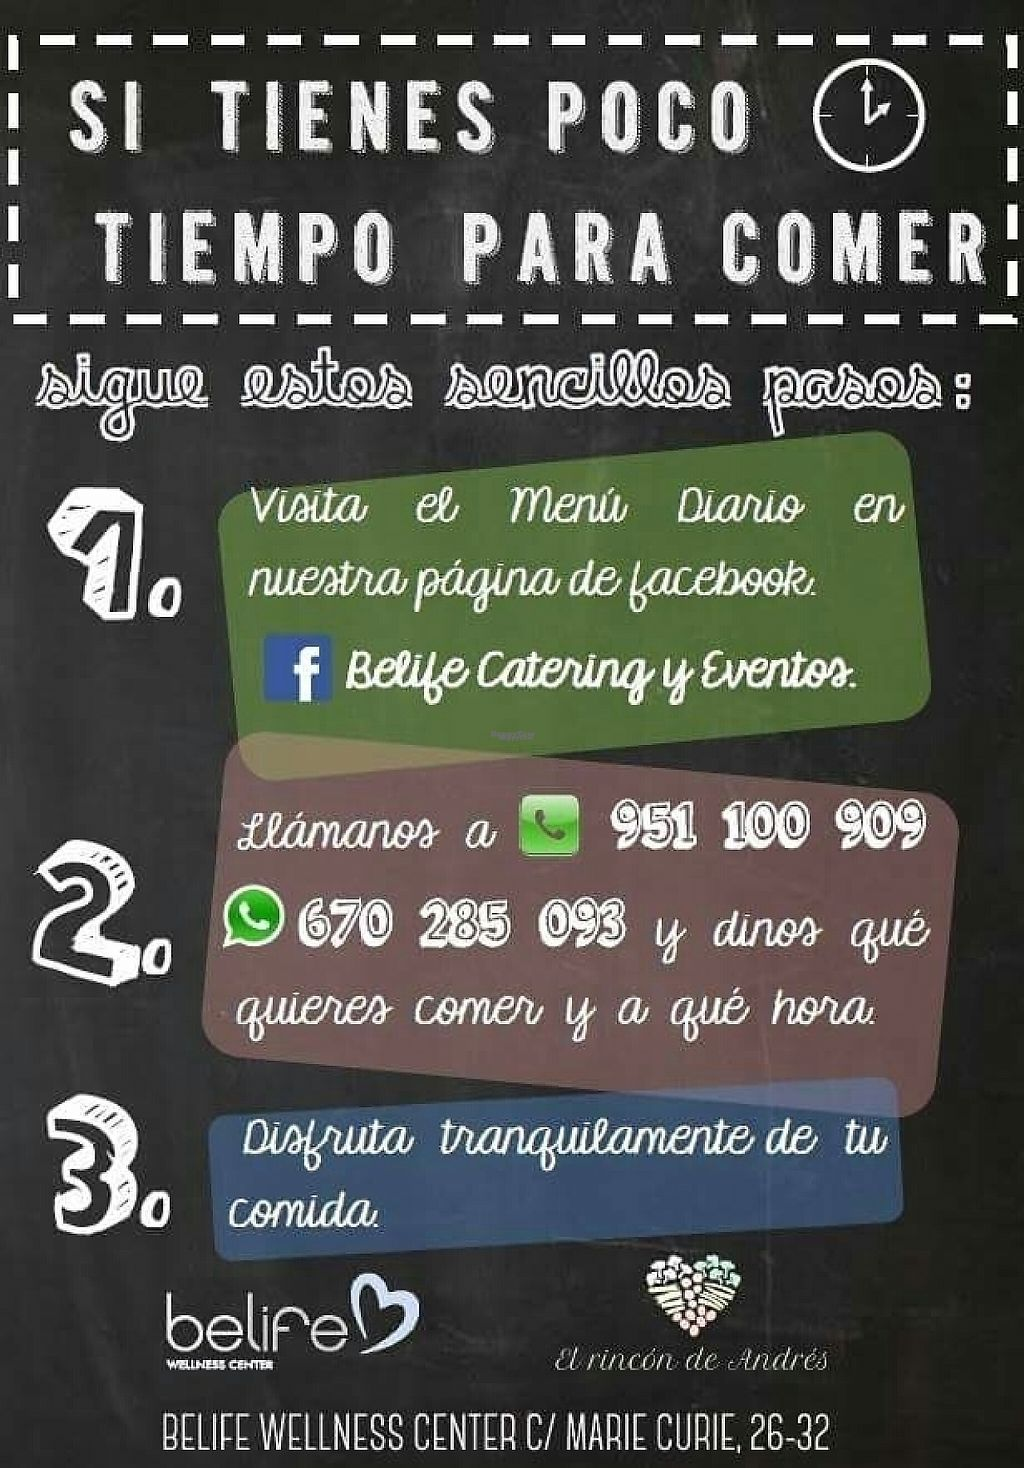 "Photo of El Rincon de Andres  by <a href=""/members/profile/Carmela79"">Carmela79</a> <br/>Teléfono <br/> February 12, 2017  - <a href='/contact/abuse/image/86851/225817'>Report</a>"